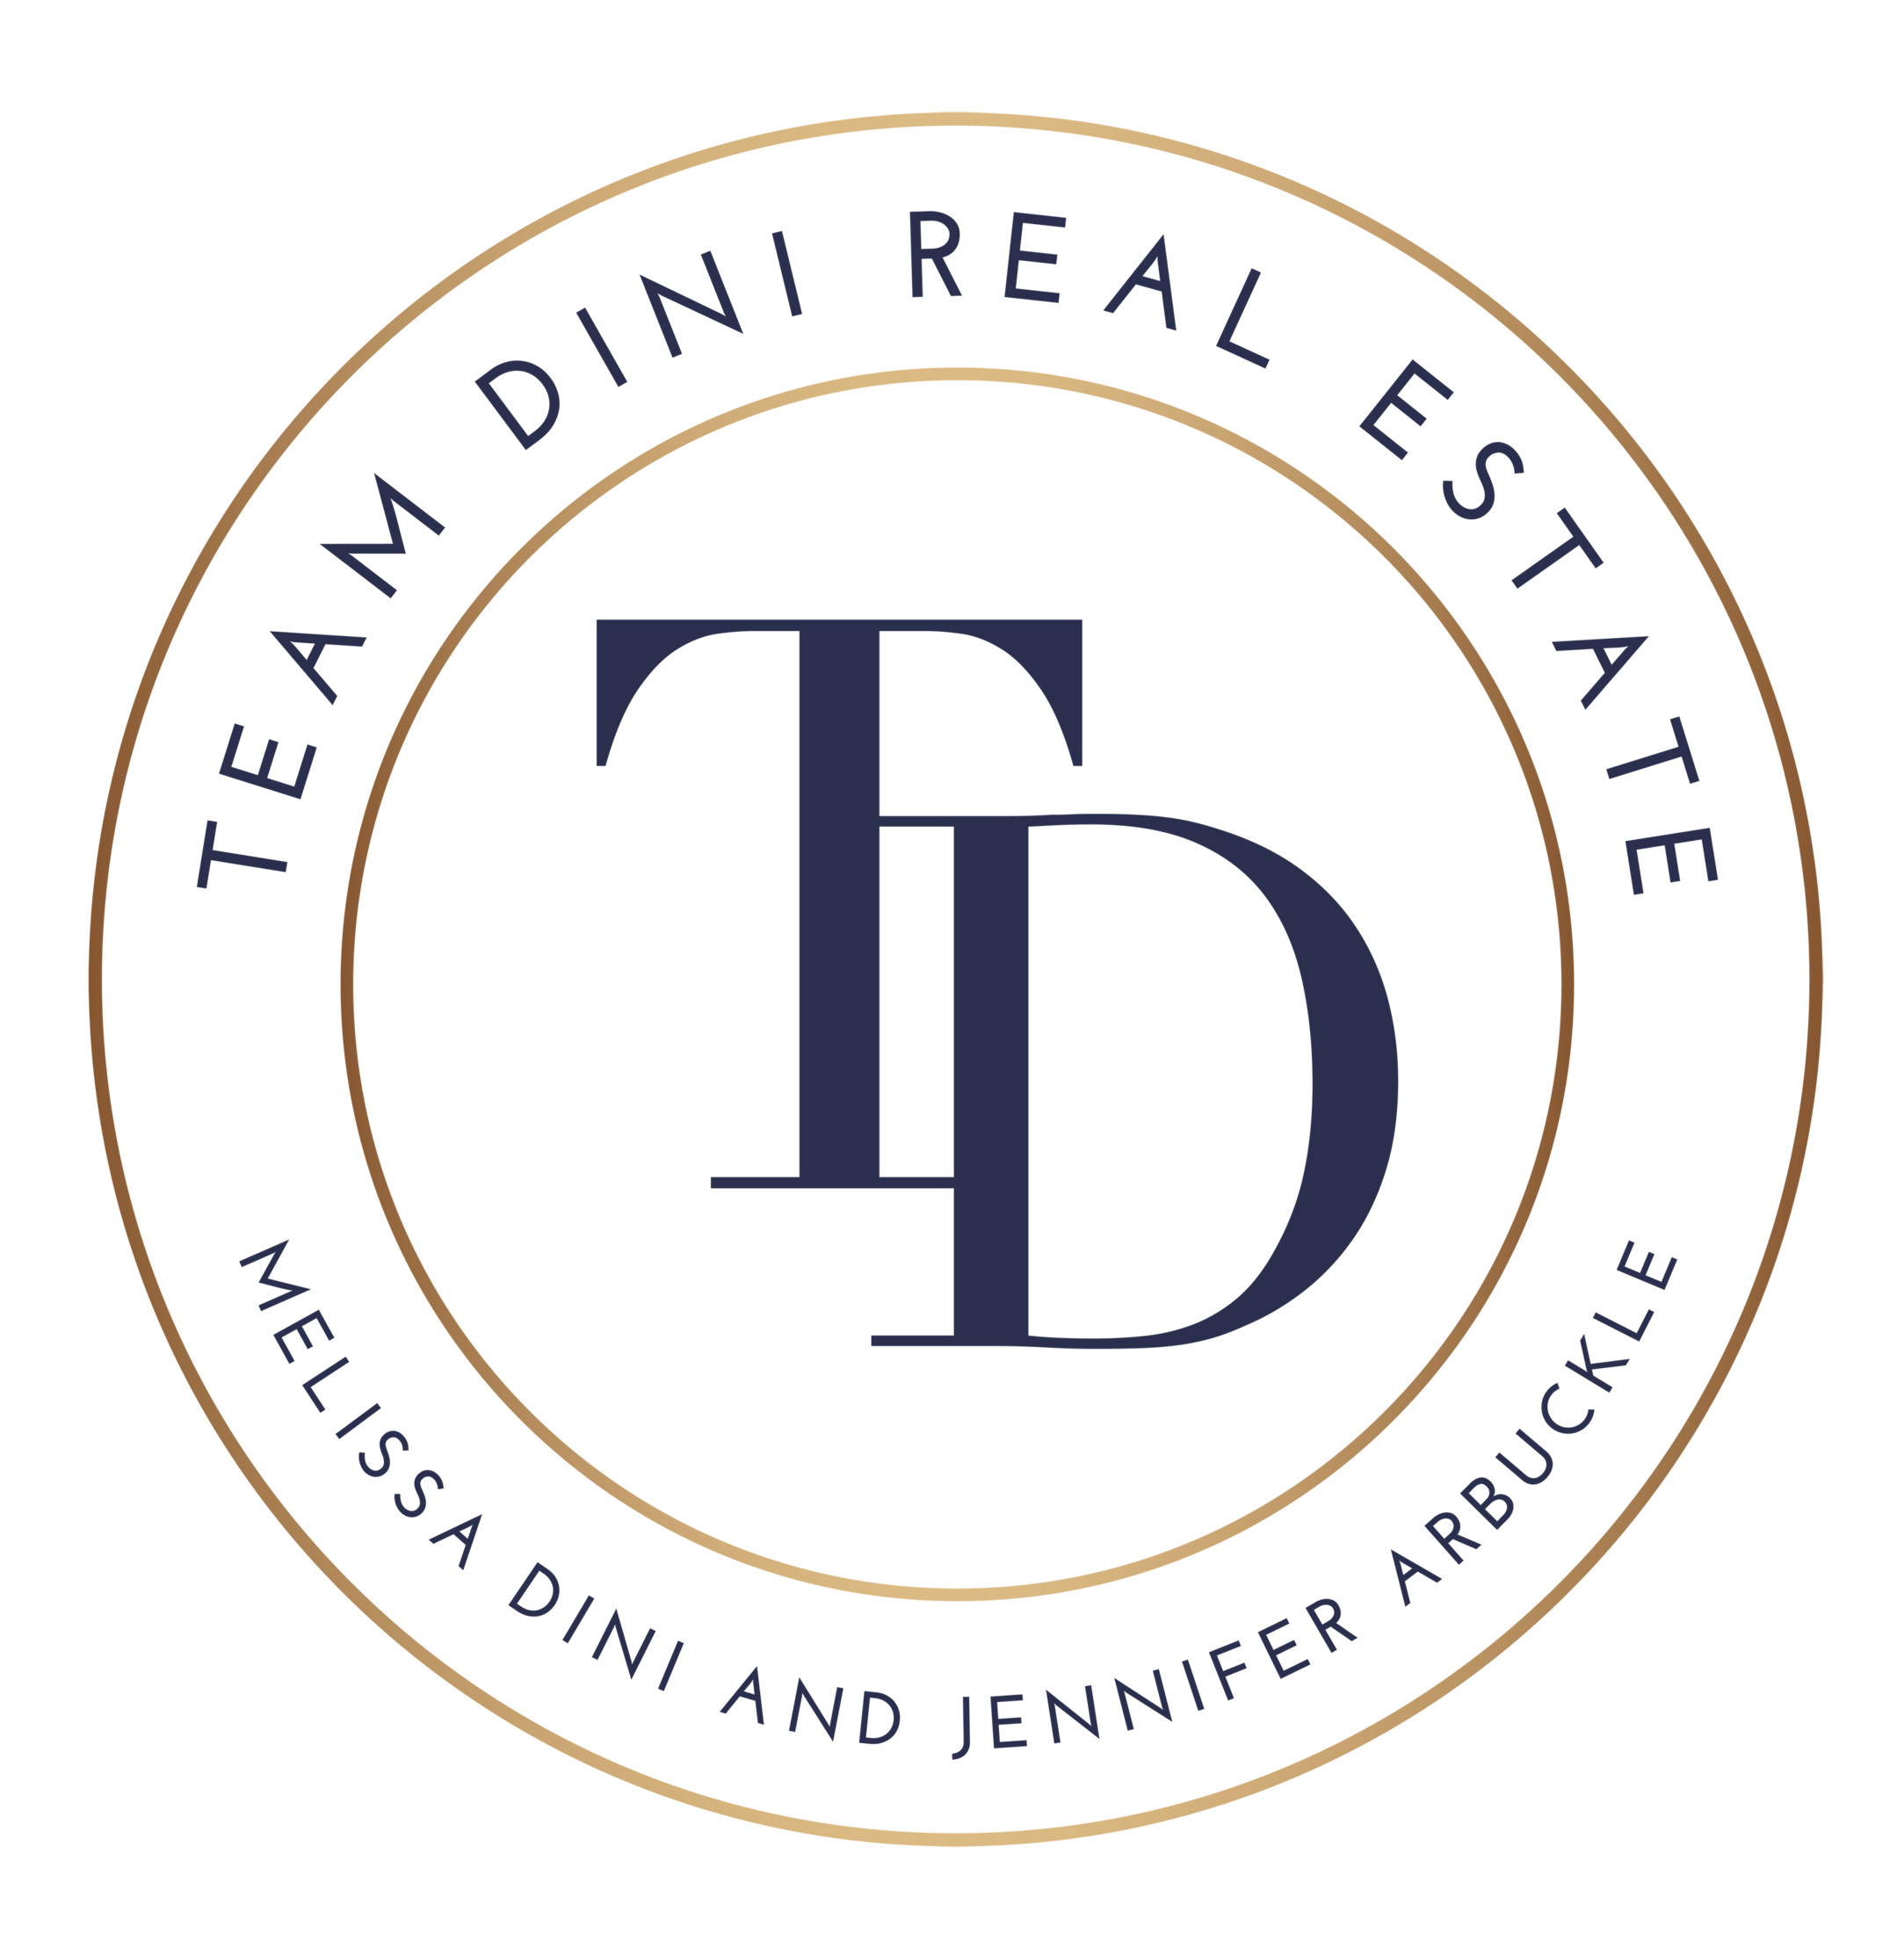 Team Dini Real Estate